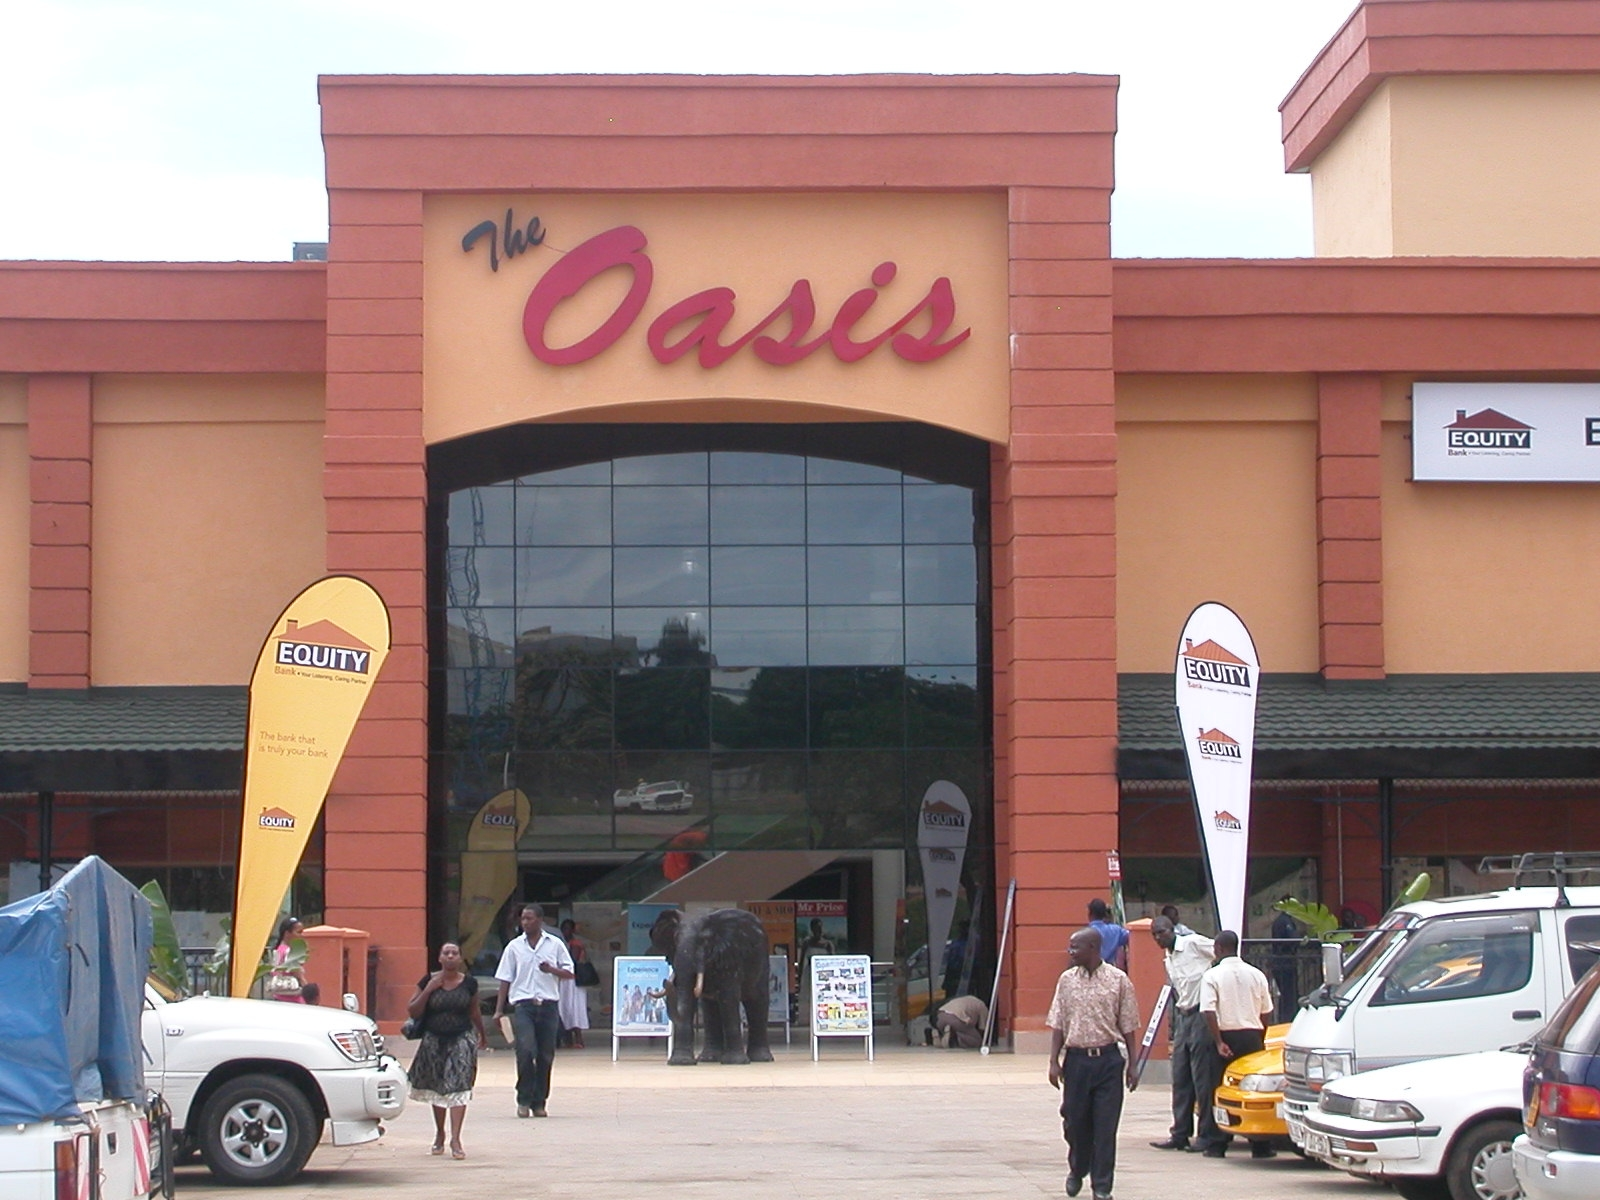 OASIS MALL 5.JPG